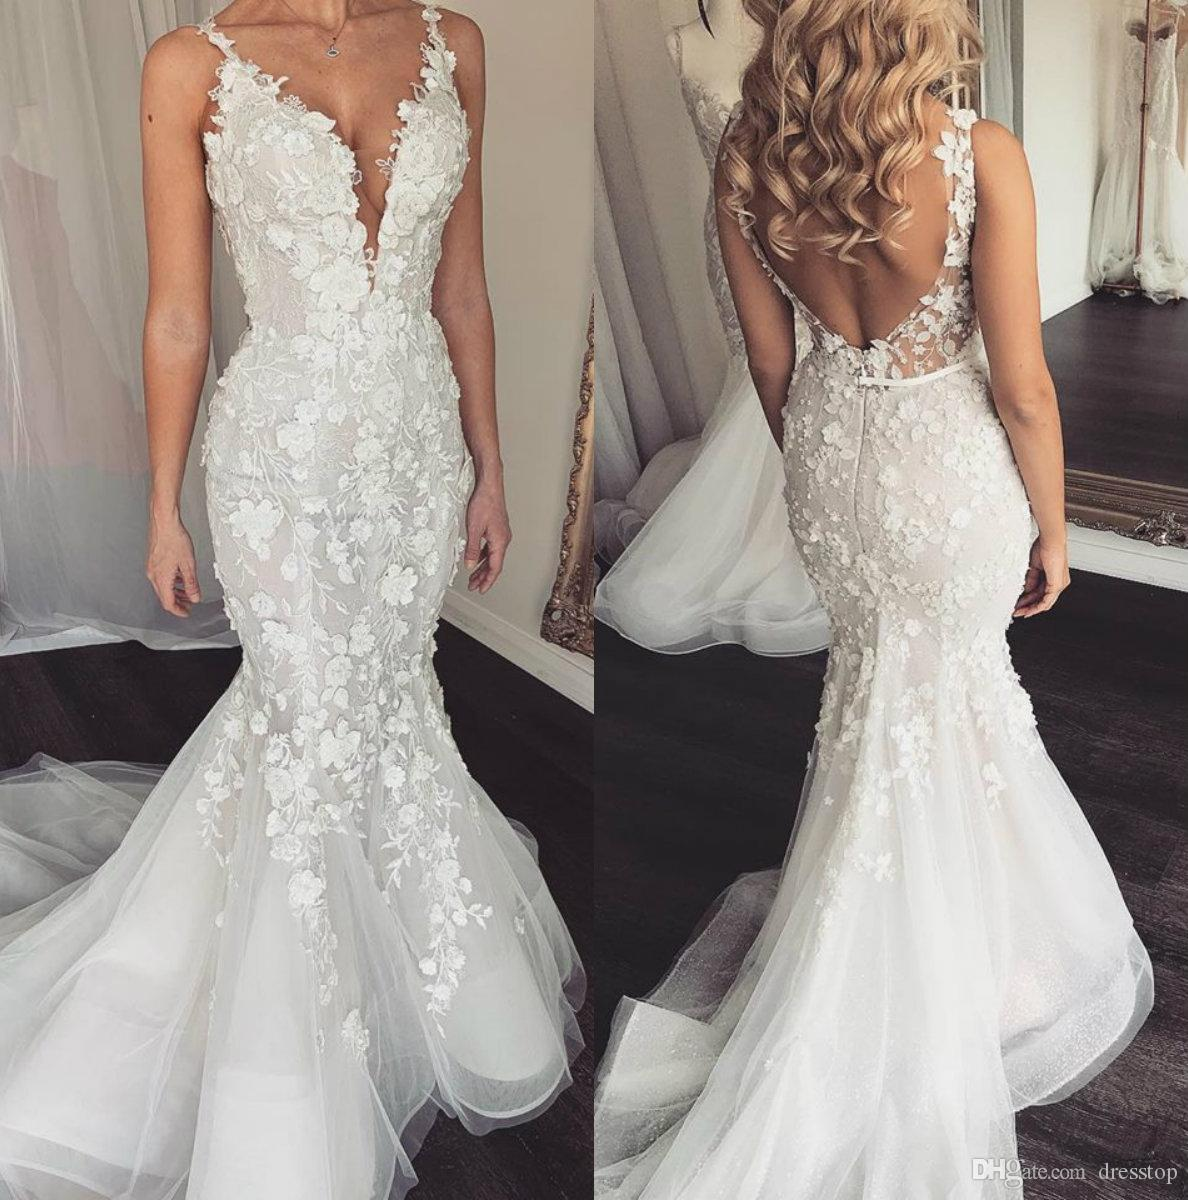 2d5bec57cb Elegant 2019 Mermaid Wedding Dresses V Neck Sleeveless Lace Bridal Gowns  Slim Fit Boho Vintage Beach Backless Wedding Dress Custom